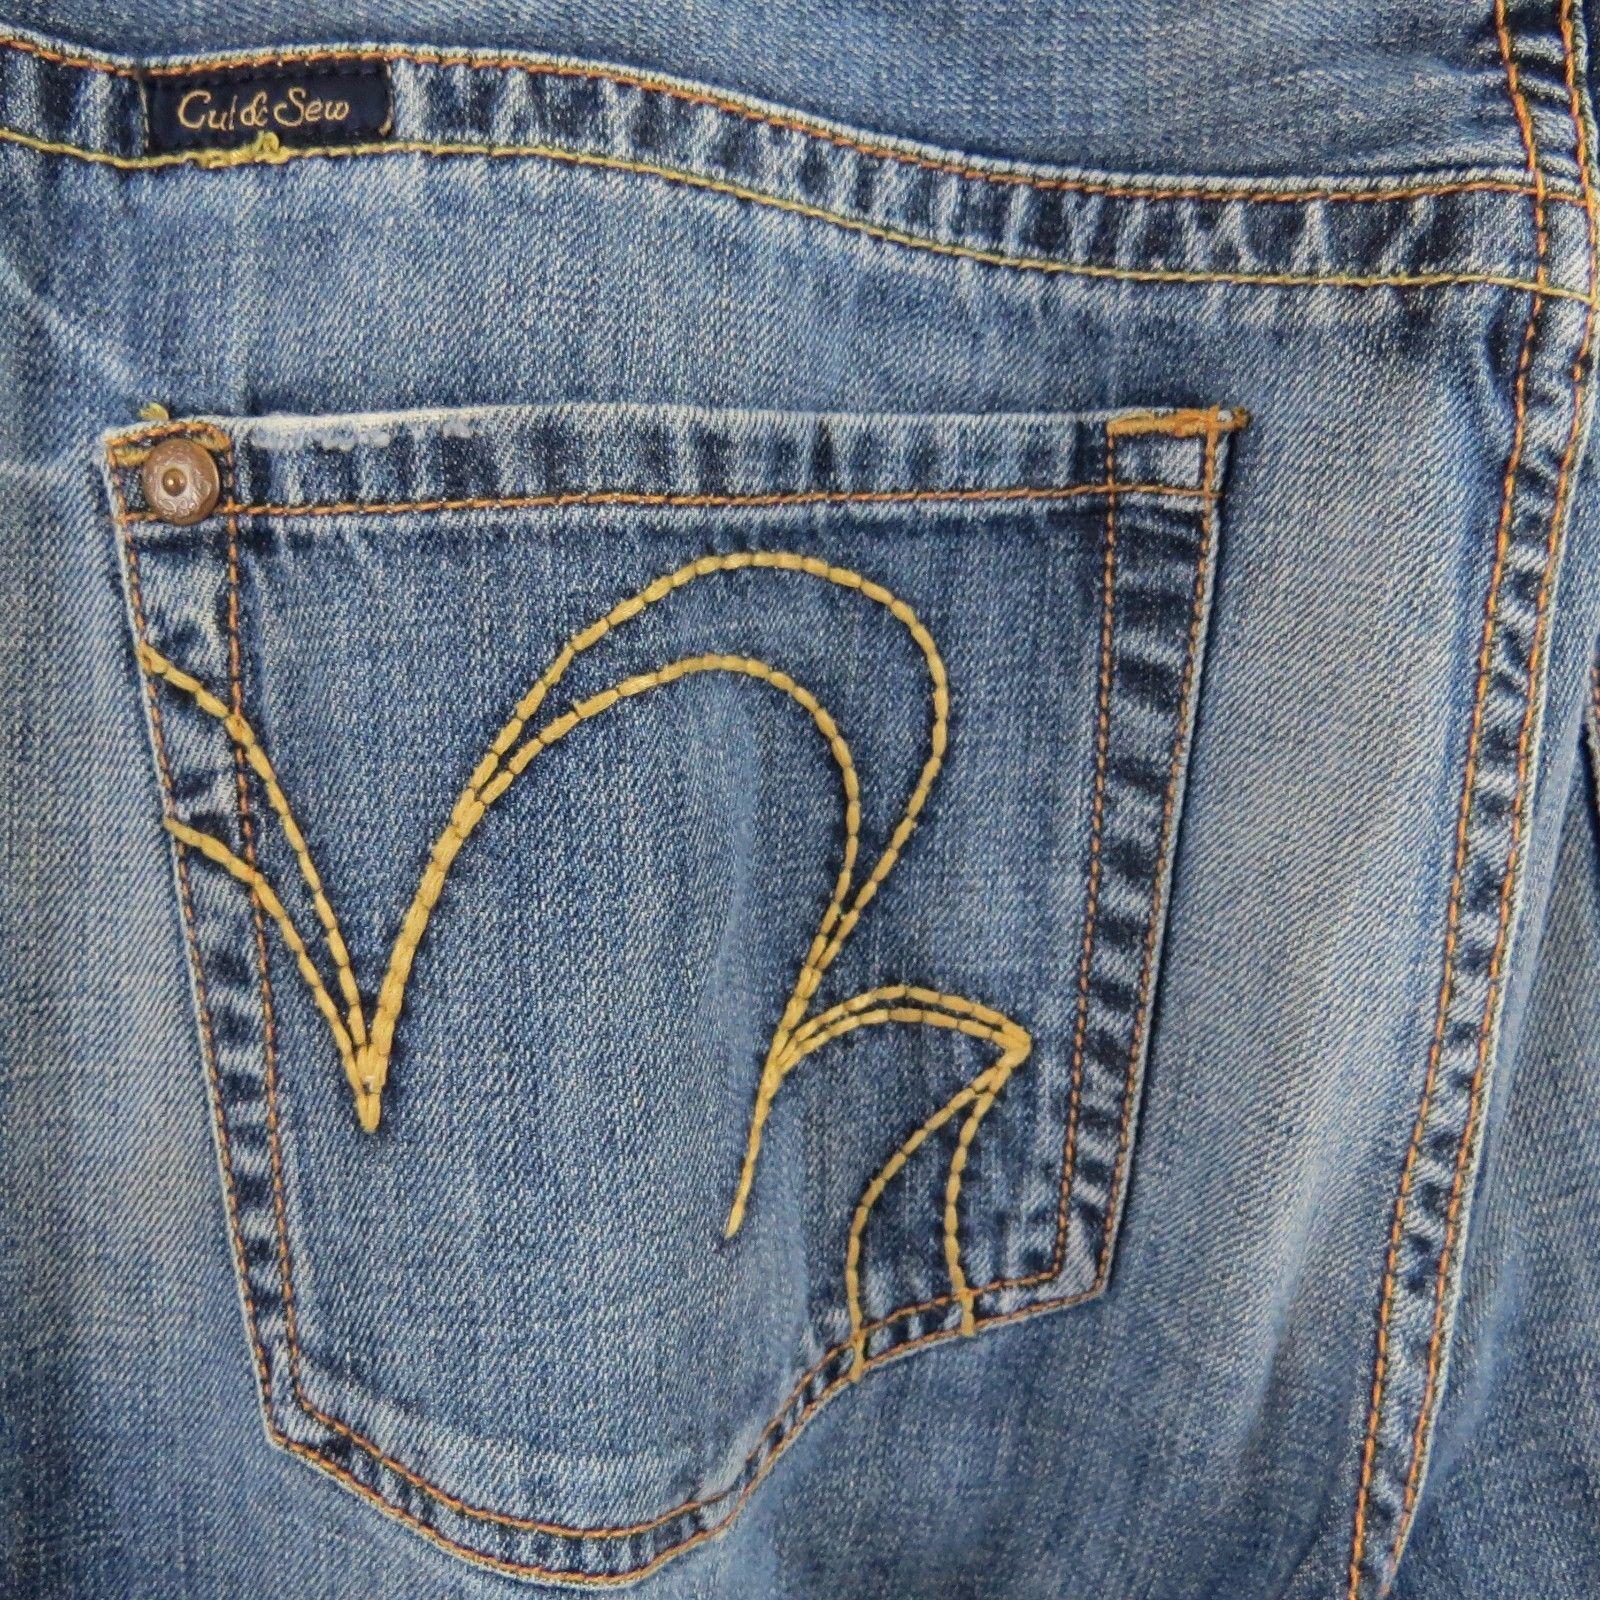 5b652448 MARC ECKO Cut & Sew Standard Cut Embroidered Jeans Men's Size 36 ...